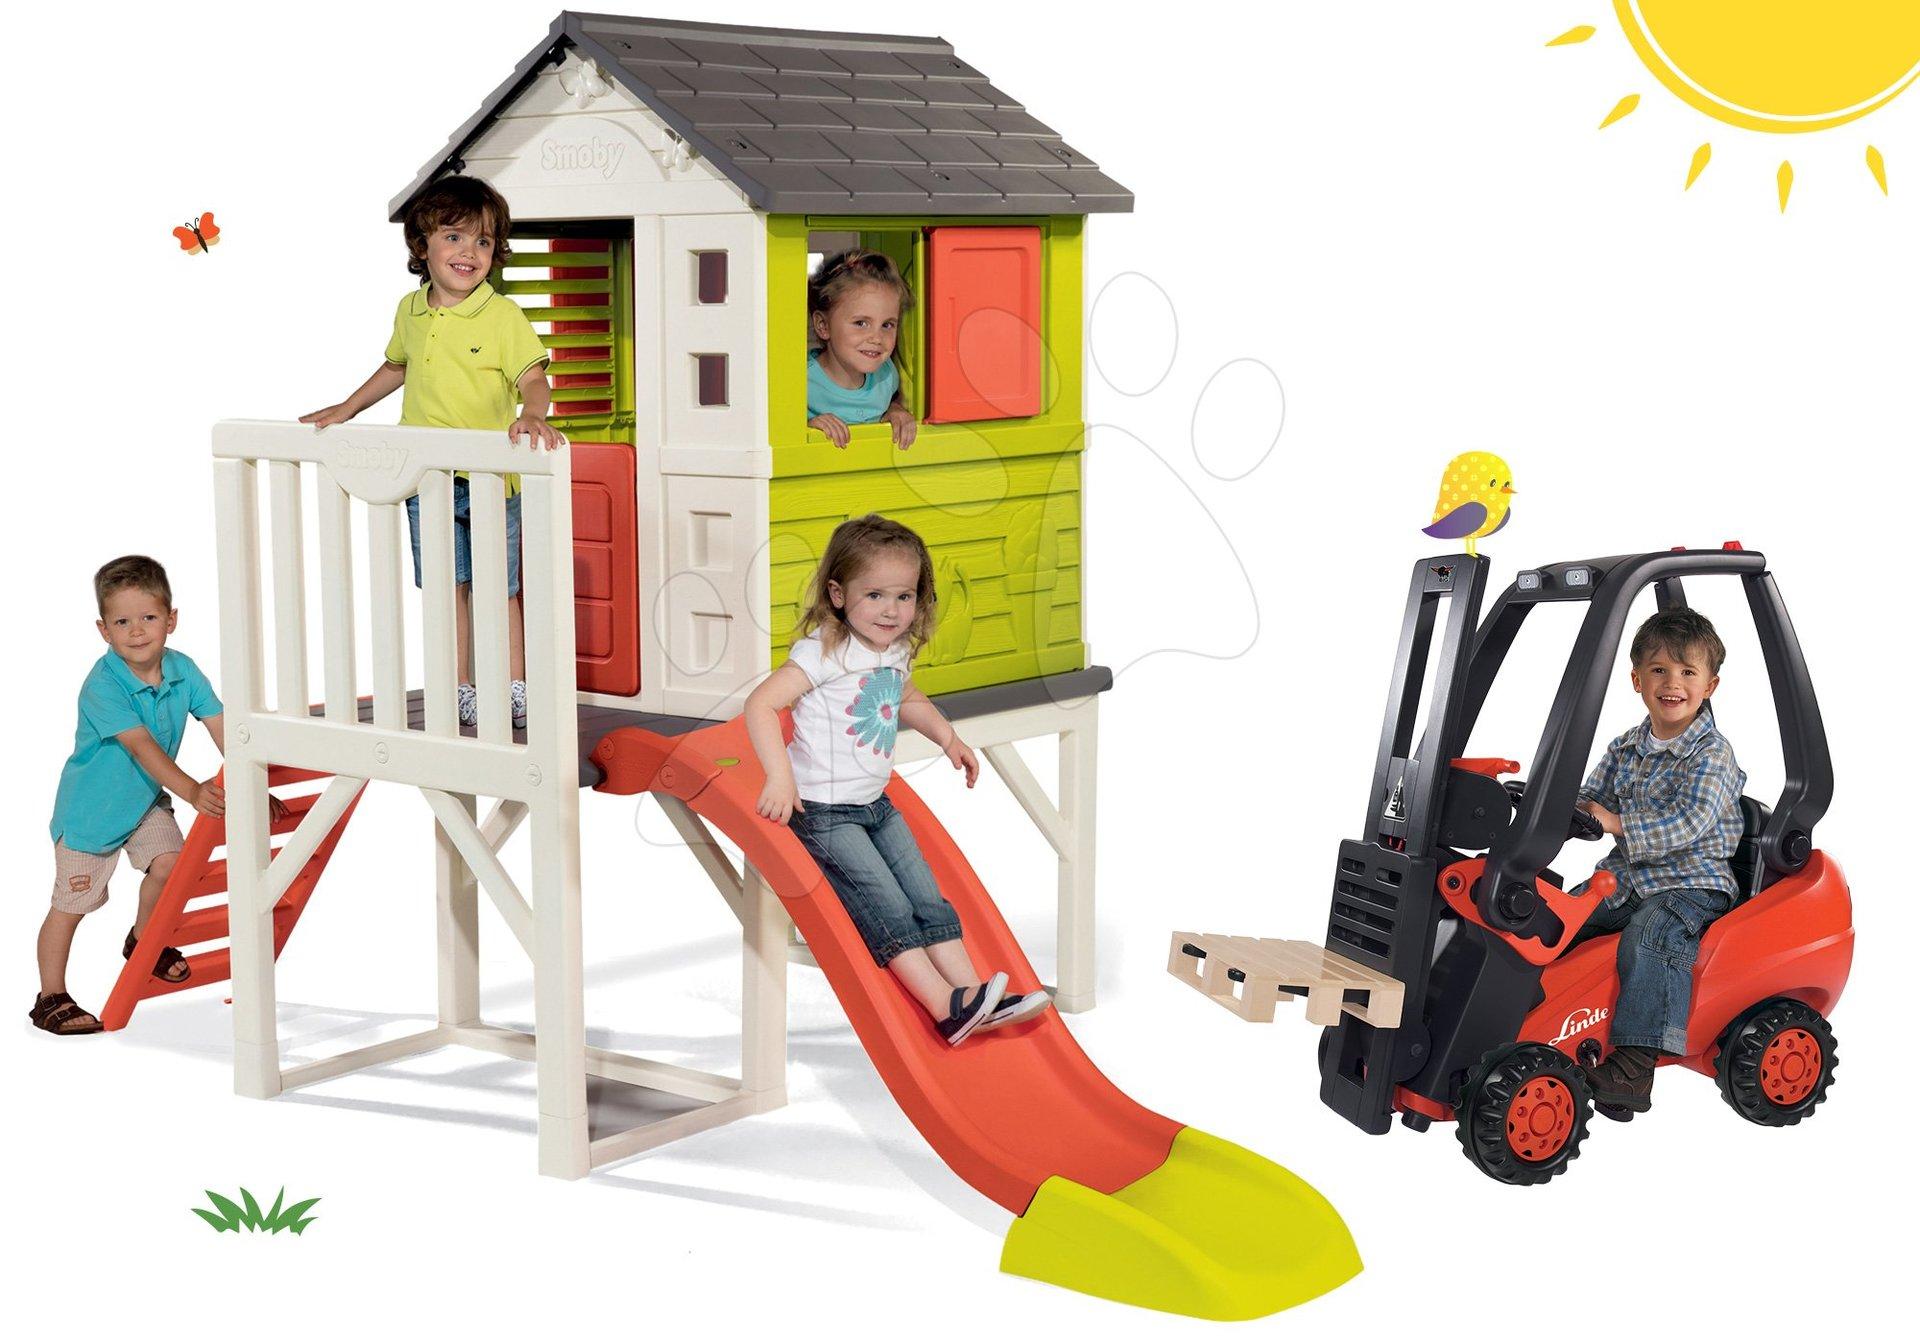 Smoby set detský domček na pilieroch Pilings House s 1,5 m šmykľavkou a vysokozdvižný vozík Linde s paletou 810800-20